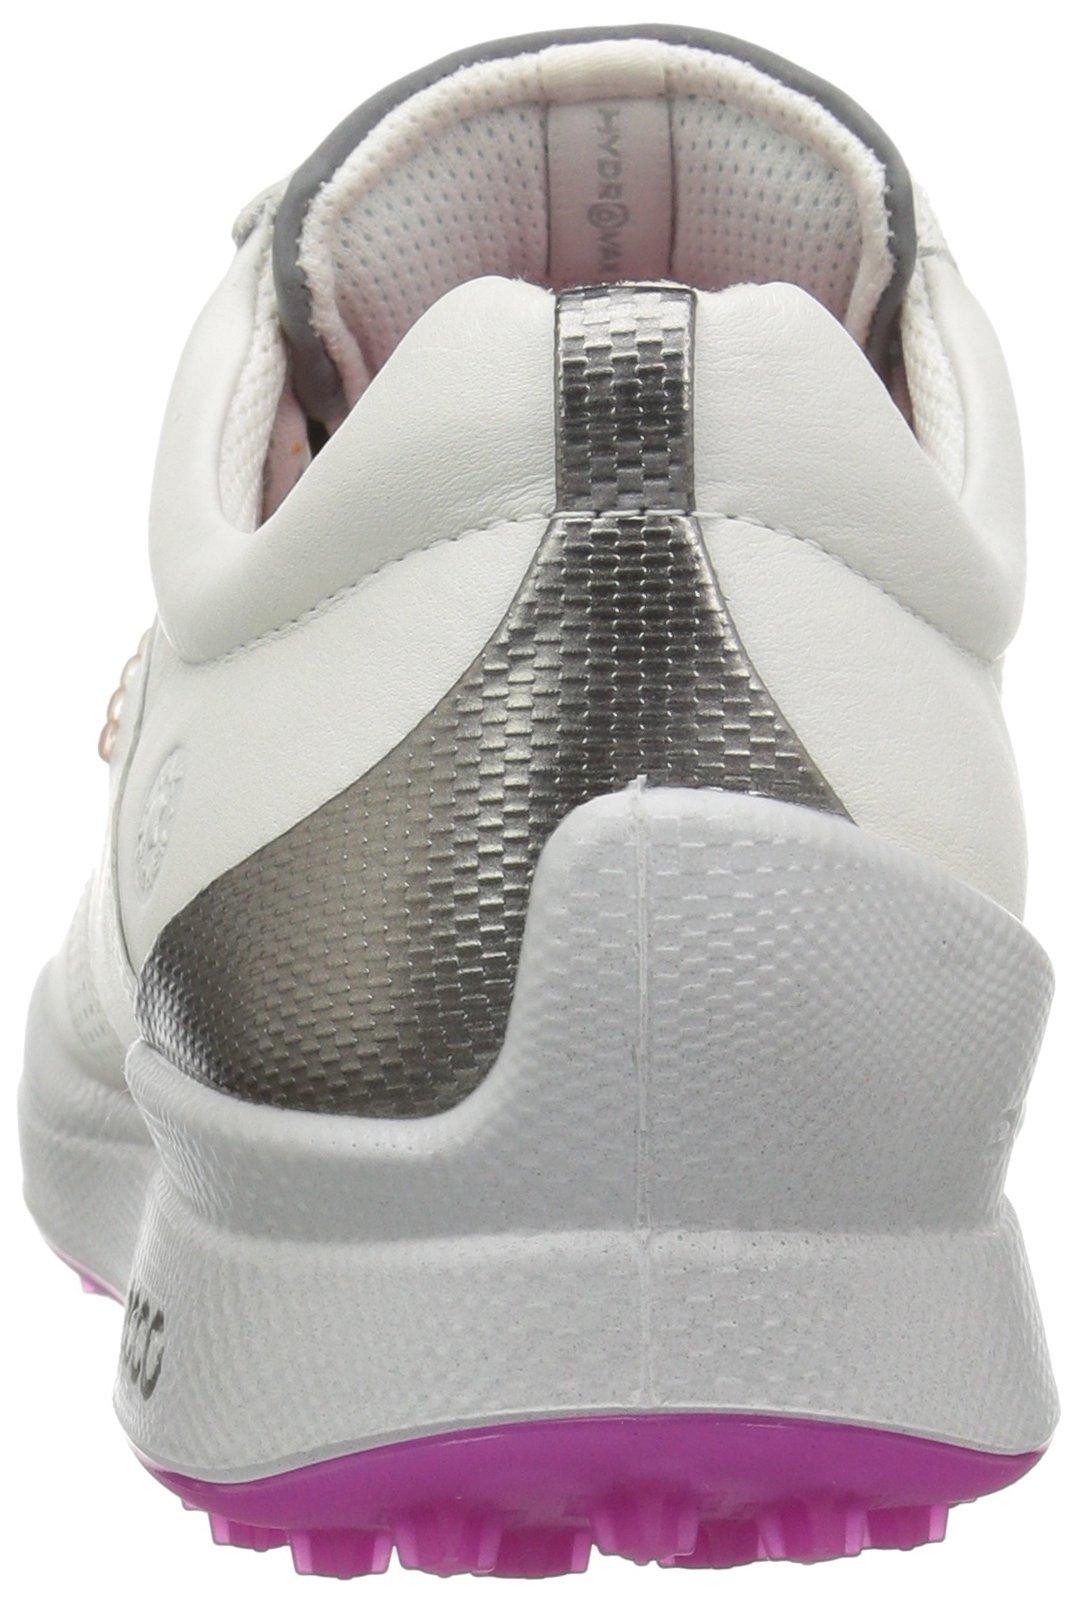 ECCO Women's Biom Hybrid Hydromax Golf Shoe, White/Candy, 39 EU/8-8.5 M US by ECCO (Image #2)